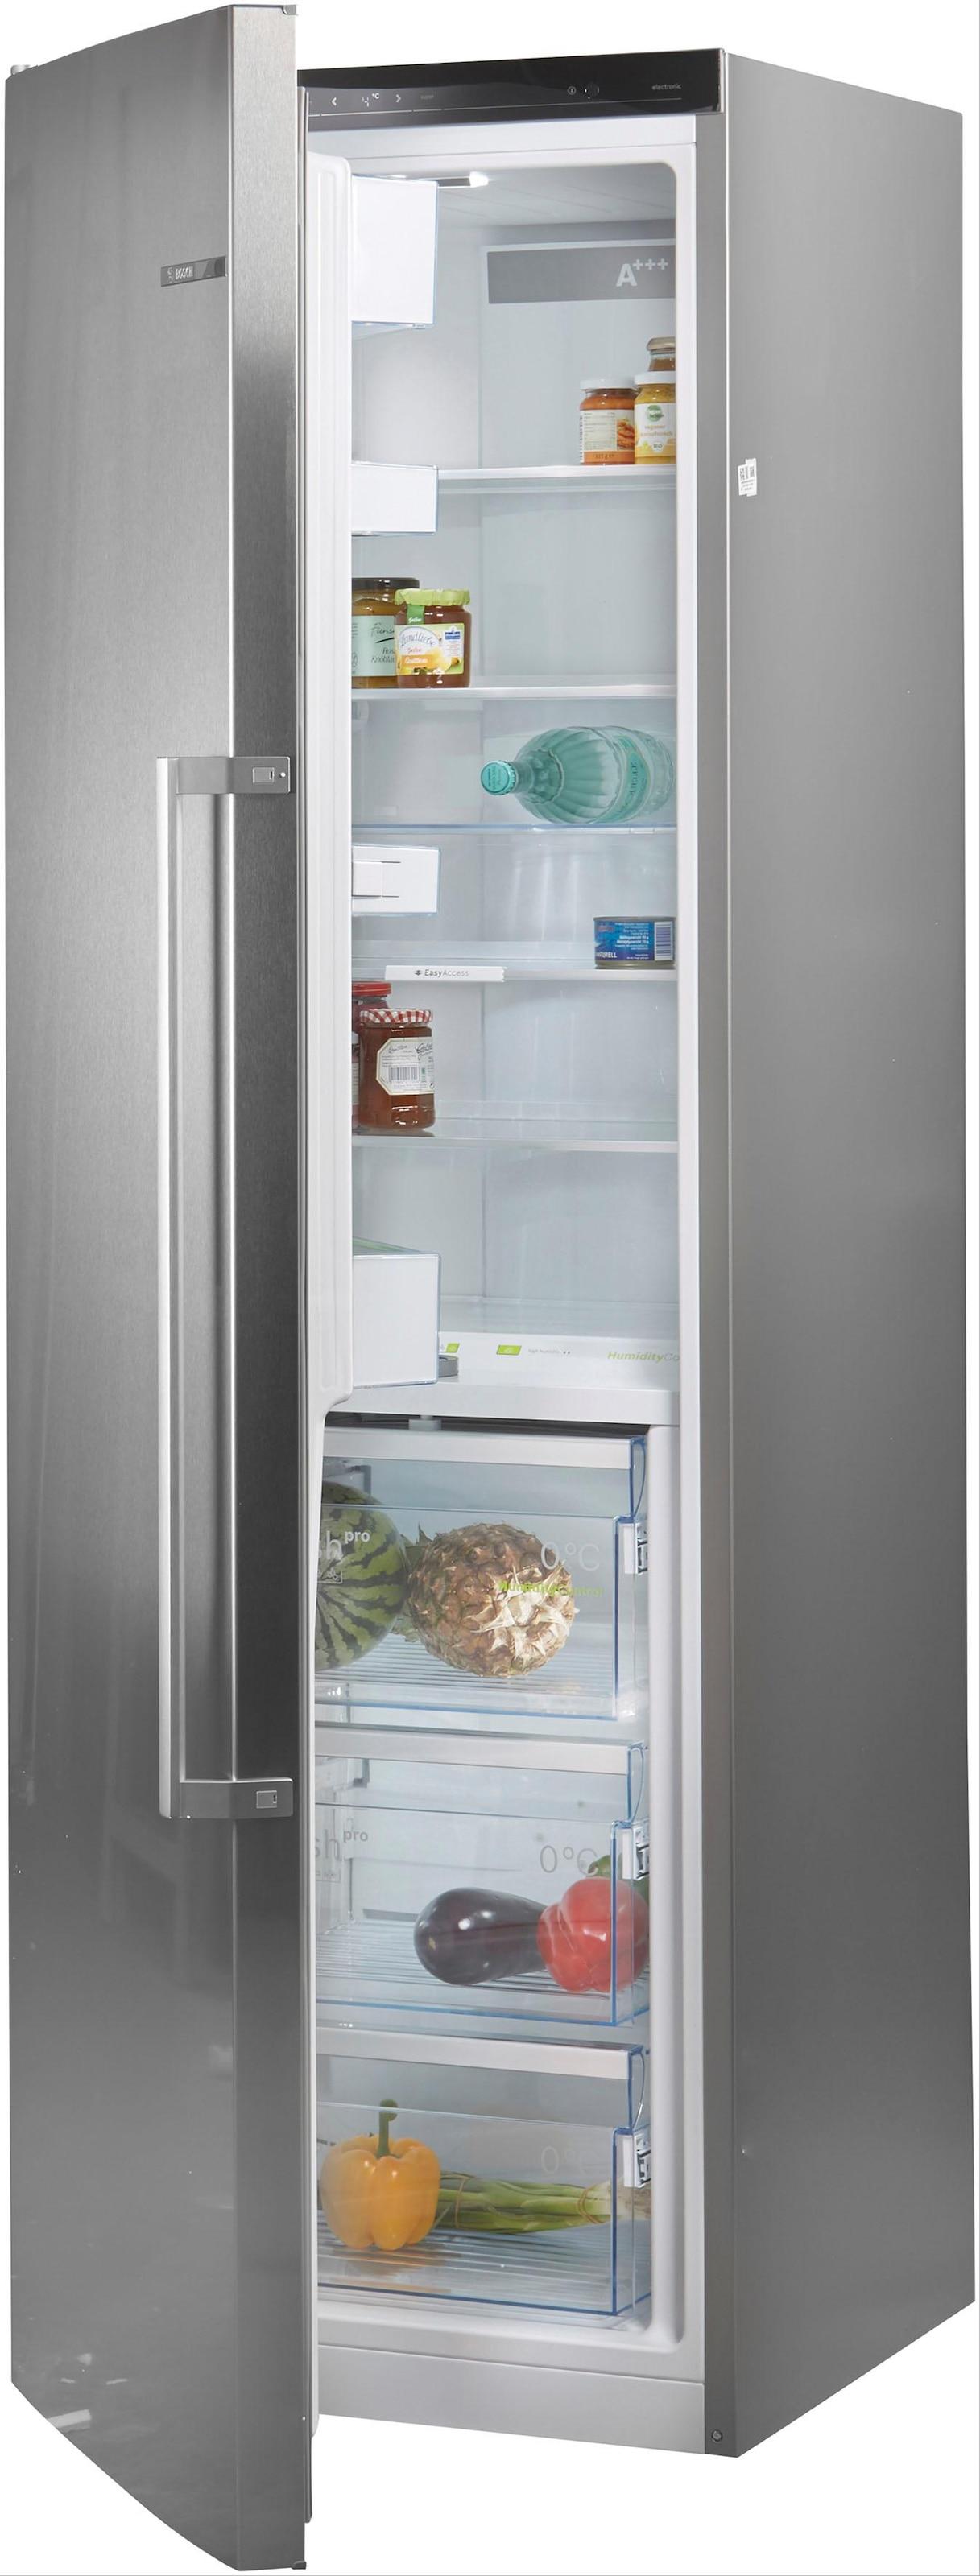 Coca Cola Retro Kühlschrank Liebherr : ᐅ coca cola usb mini kühlschrank ᐅ kaufberatung angebote